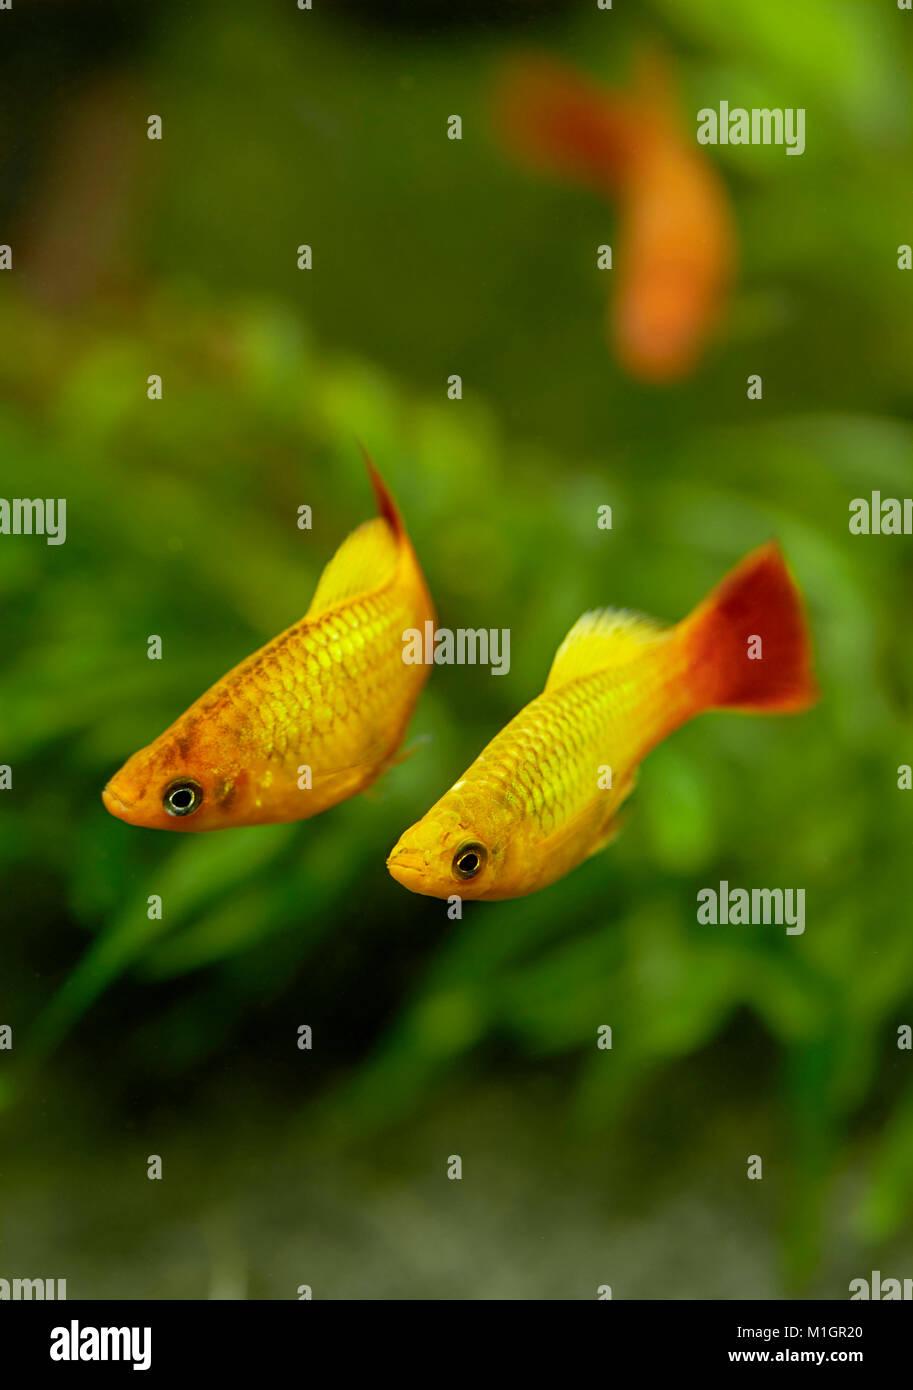 Common Platy (Xiphophorus maculatus). Displaying couple in an aquarium . Stock Photo